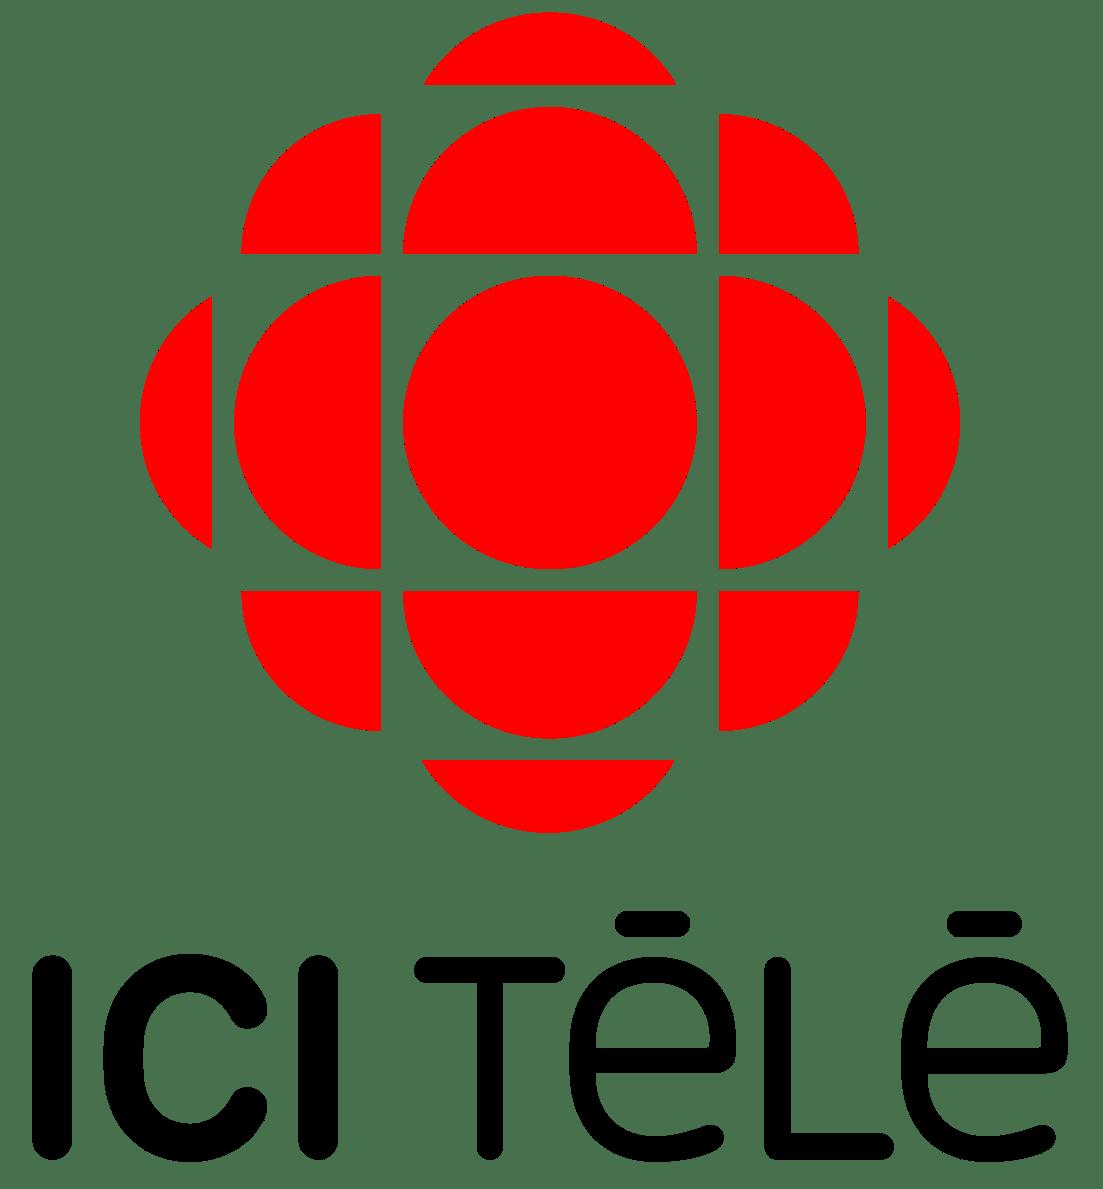 ICI Tele Montreal